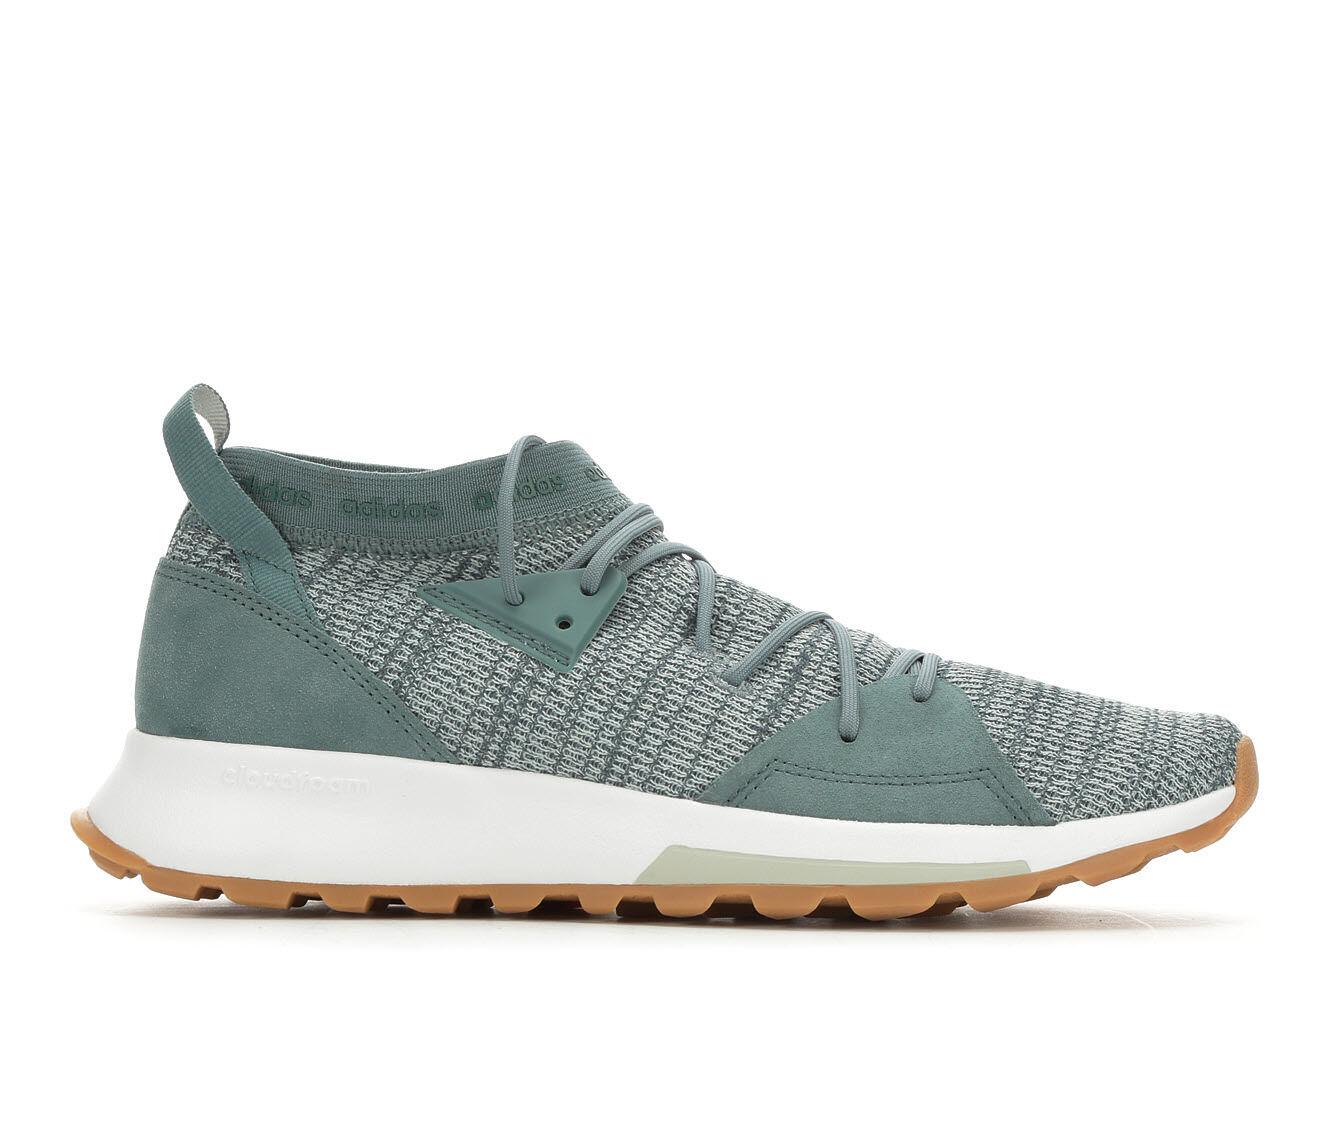 Women's Adidas Cloudfoam Quesa Slip-On Sneakers Green/Silv/Wht